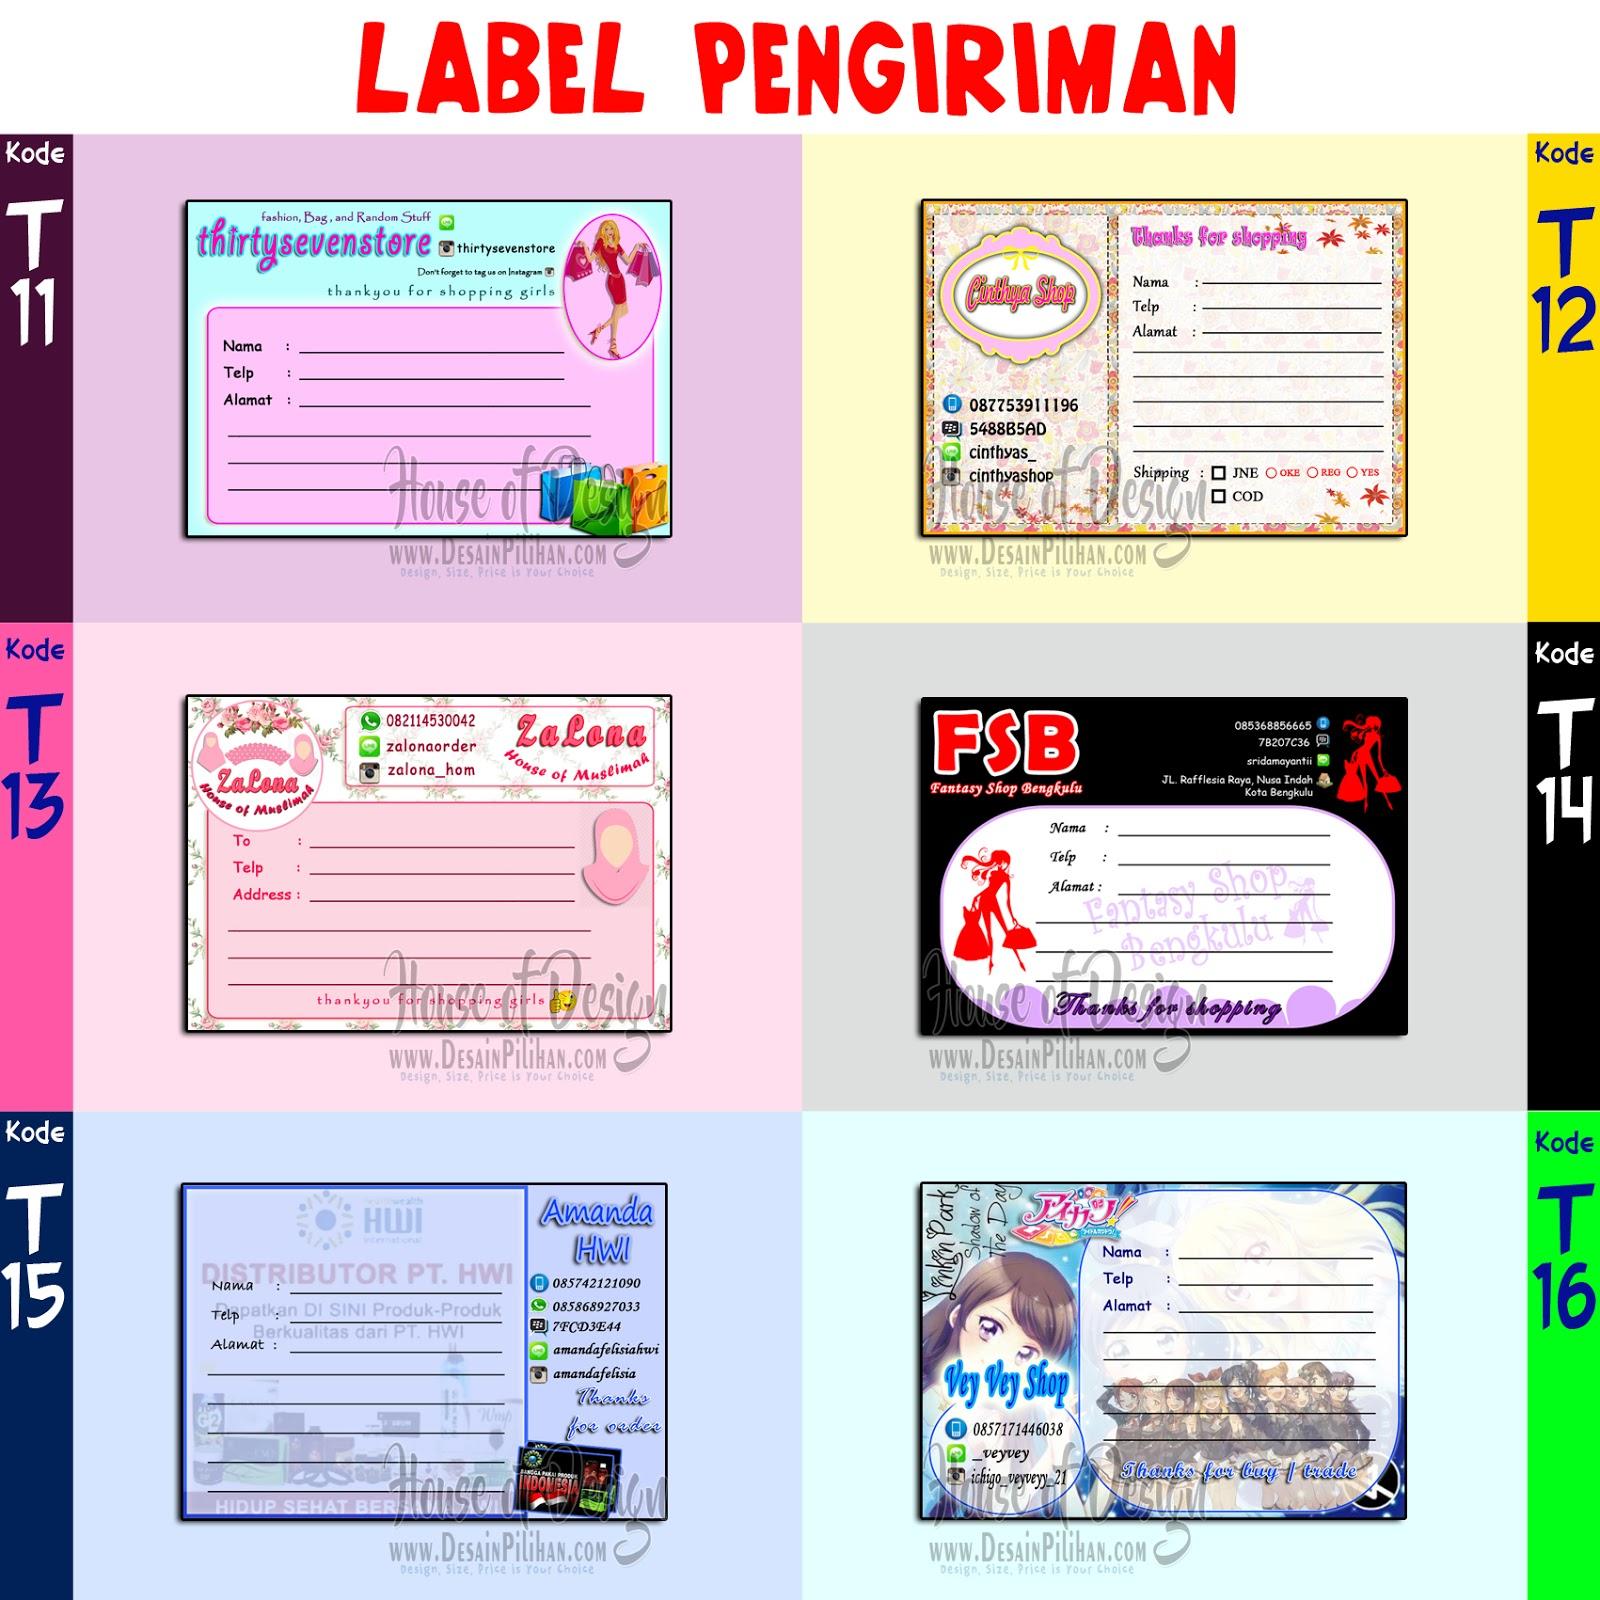 jual stiker pengiriman murah, katalog sticker shipping, design sticker shipping